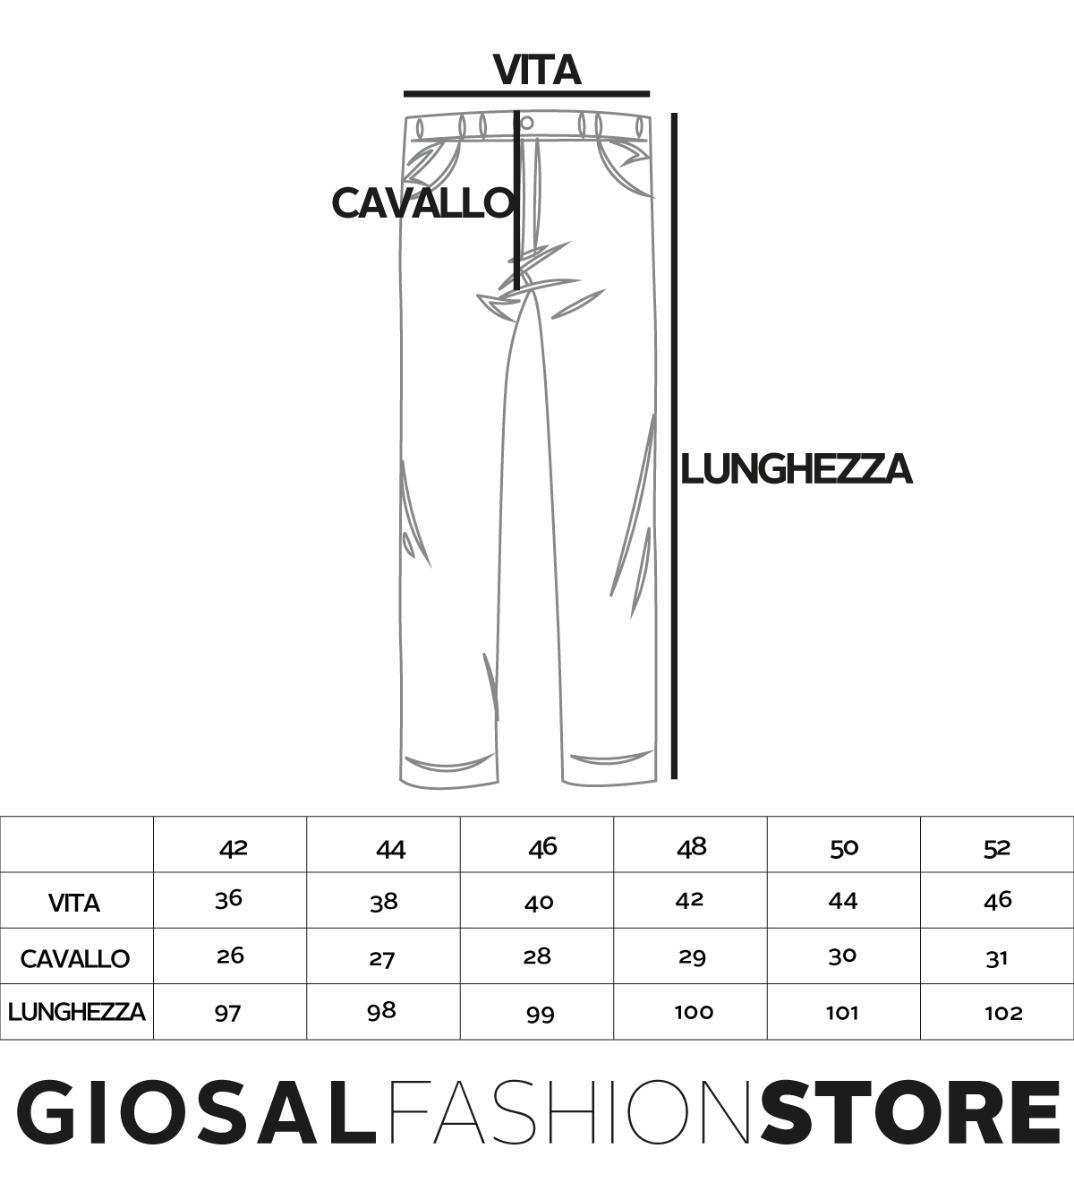 Pantalone-Uomo-con-Pence-Tasca-America-Blu-Tinta-Unita-Cavallo-Basso-Regular miniatura 8